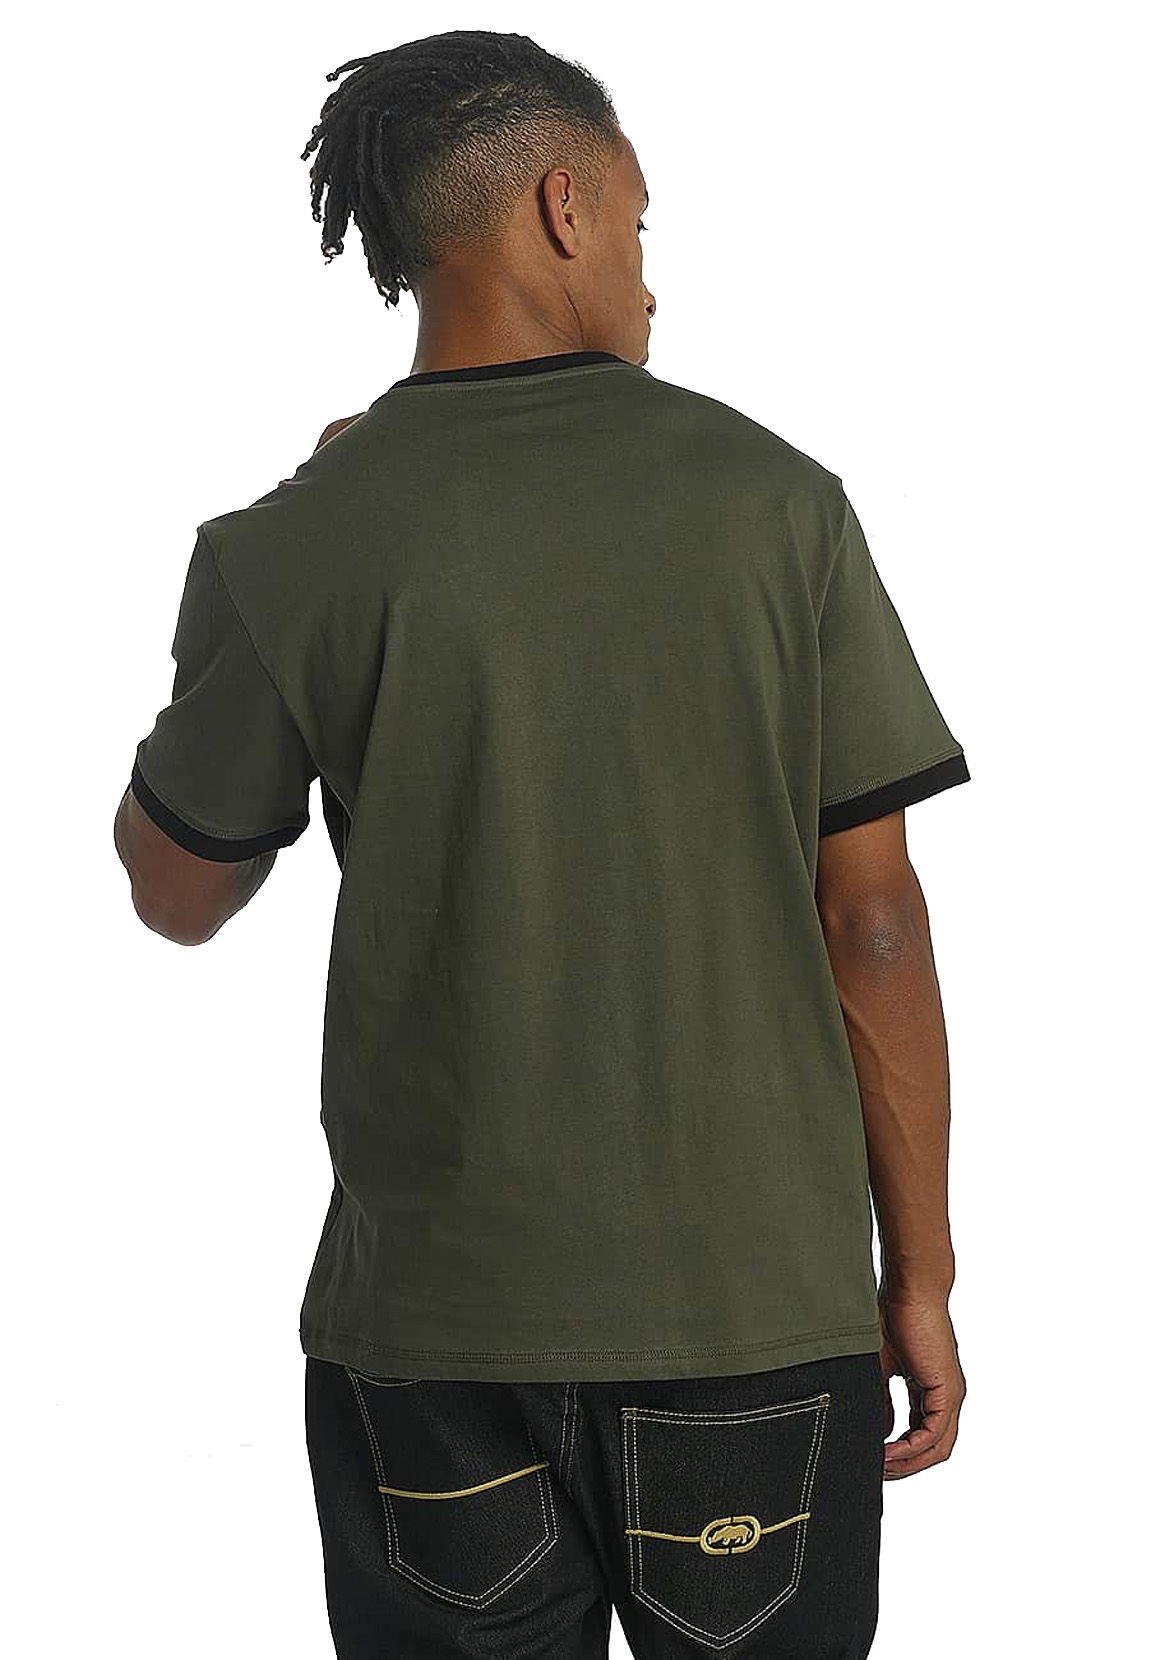 online store c15ed 9d62e Ecko Unltd T-Shirt Herren FIRST AVENUE T-Shirt Khaki Olive